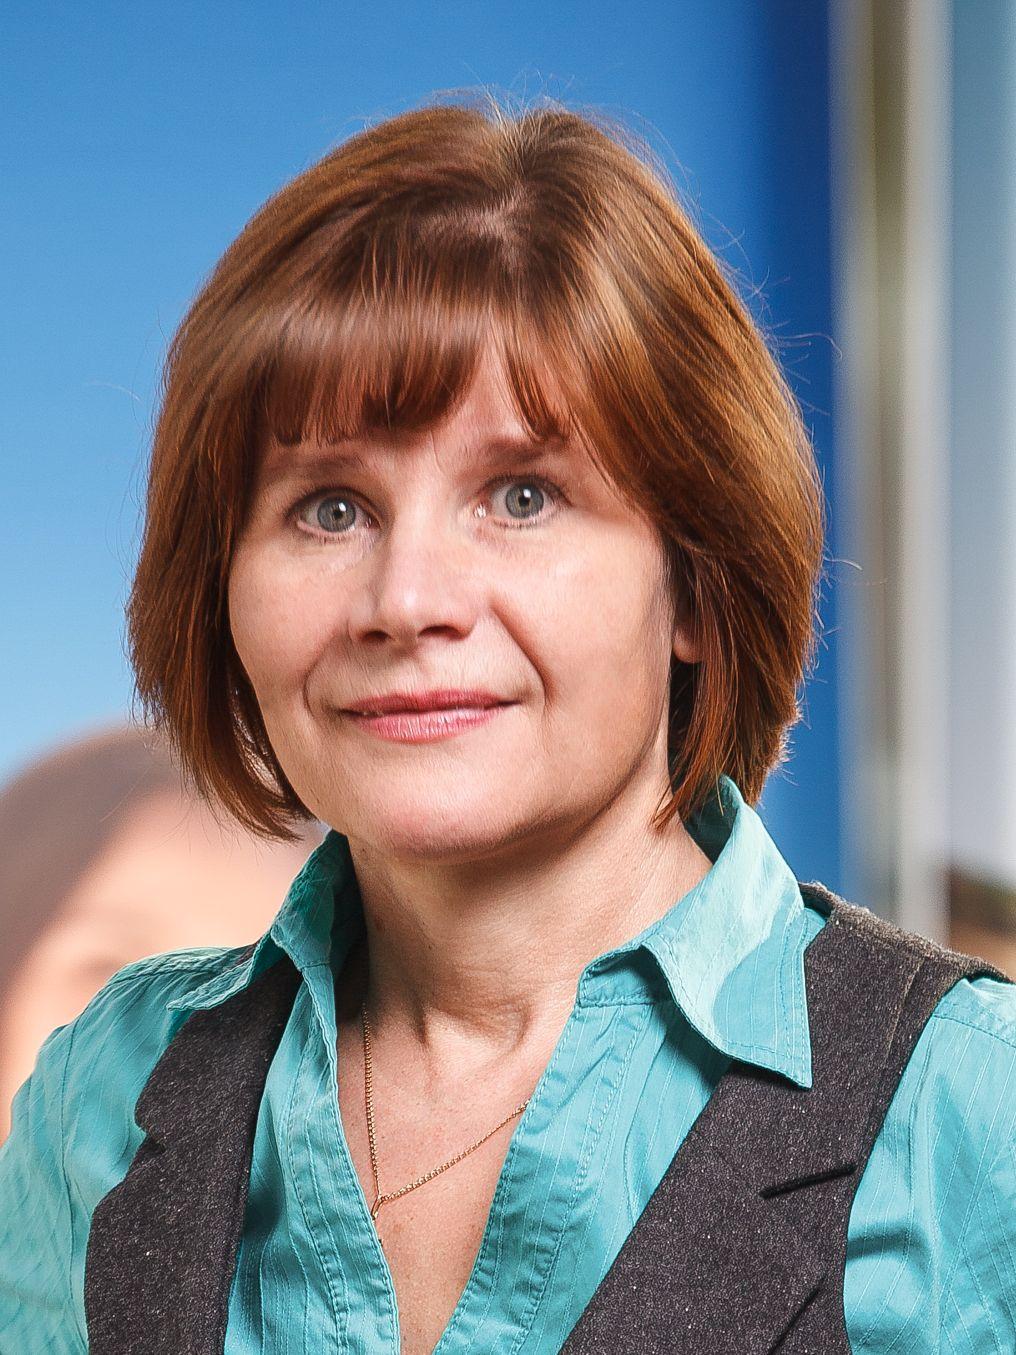 Lidia Hauff